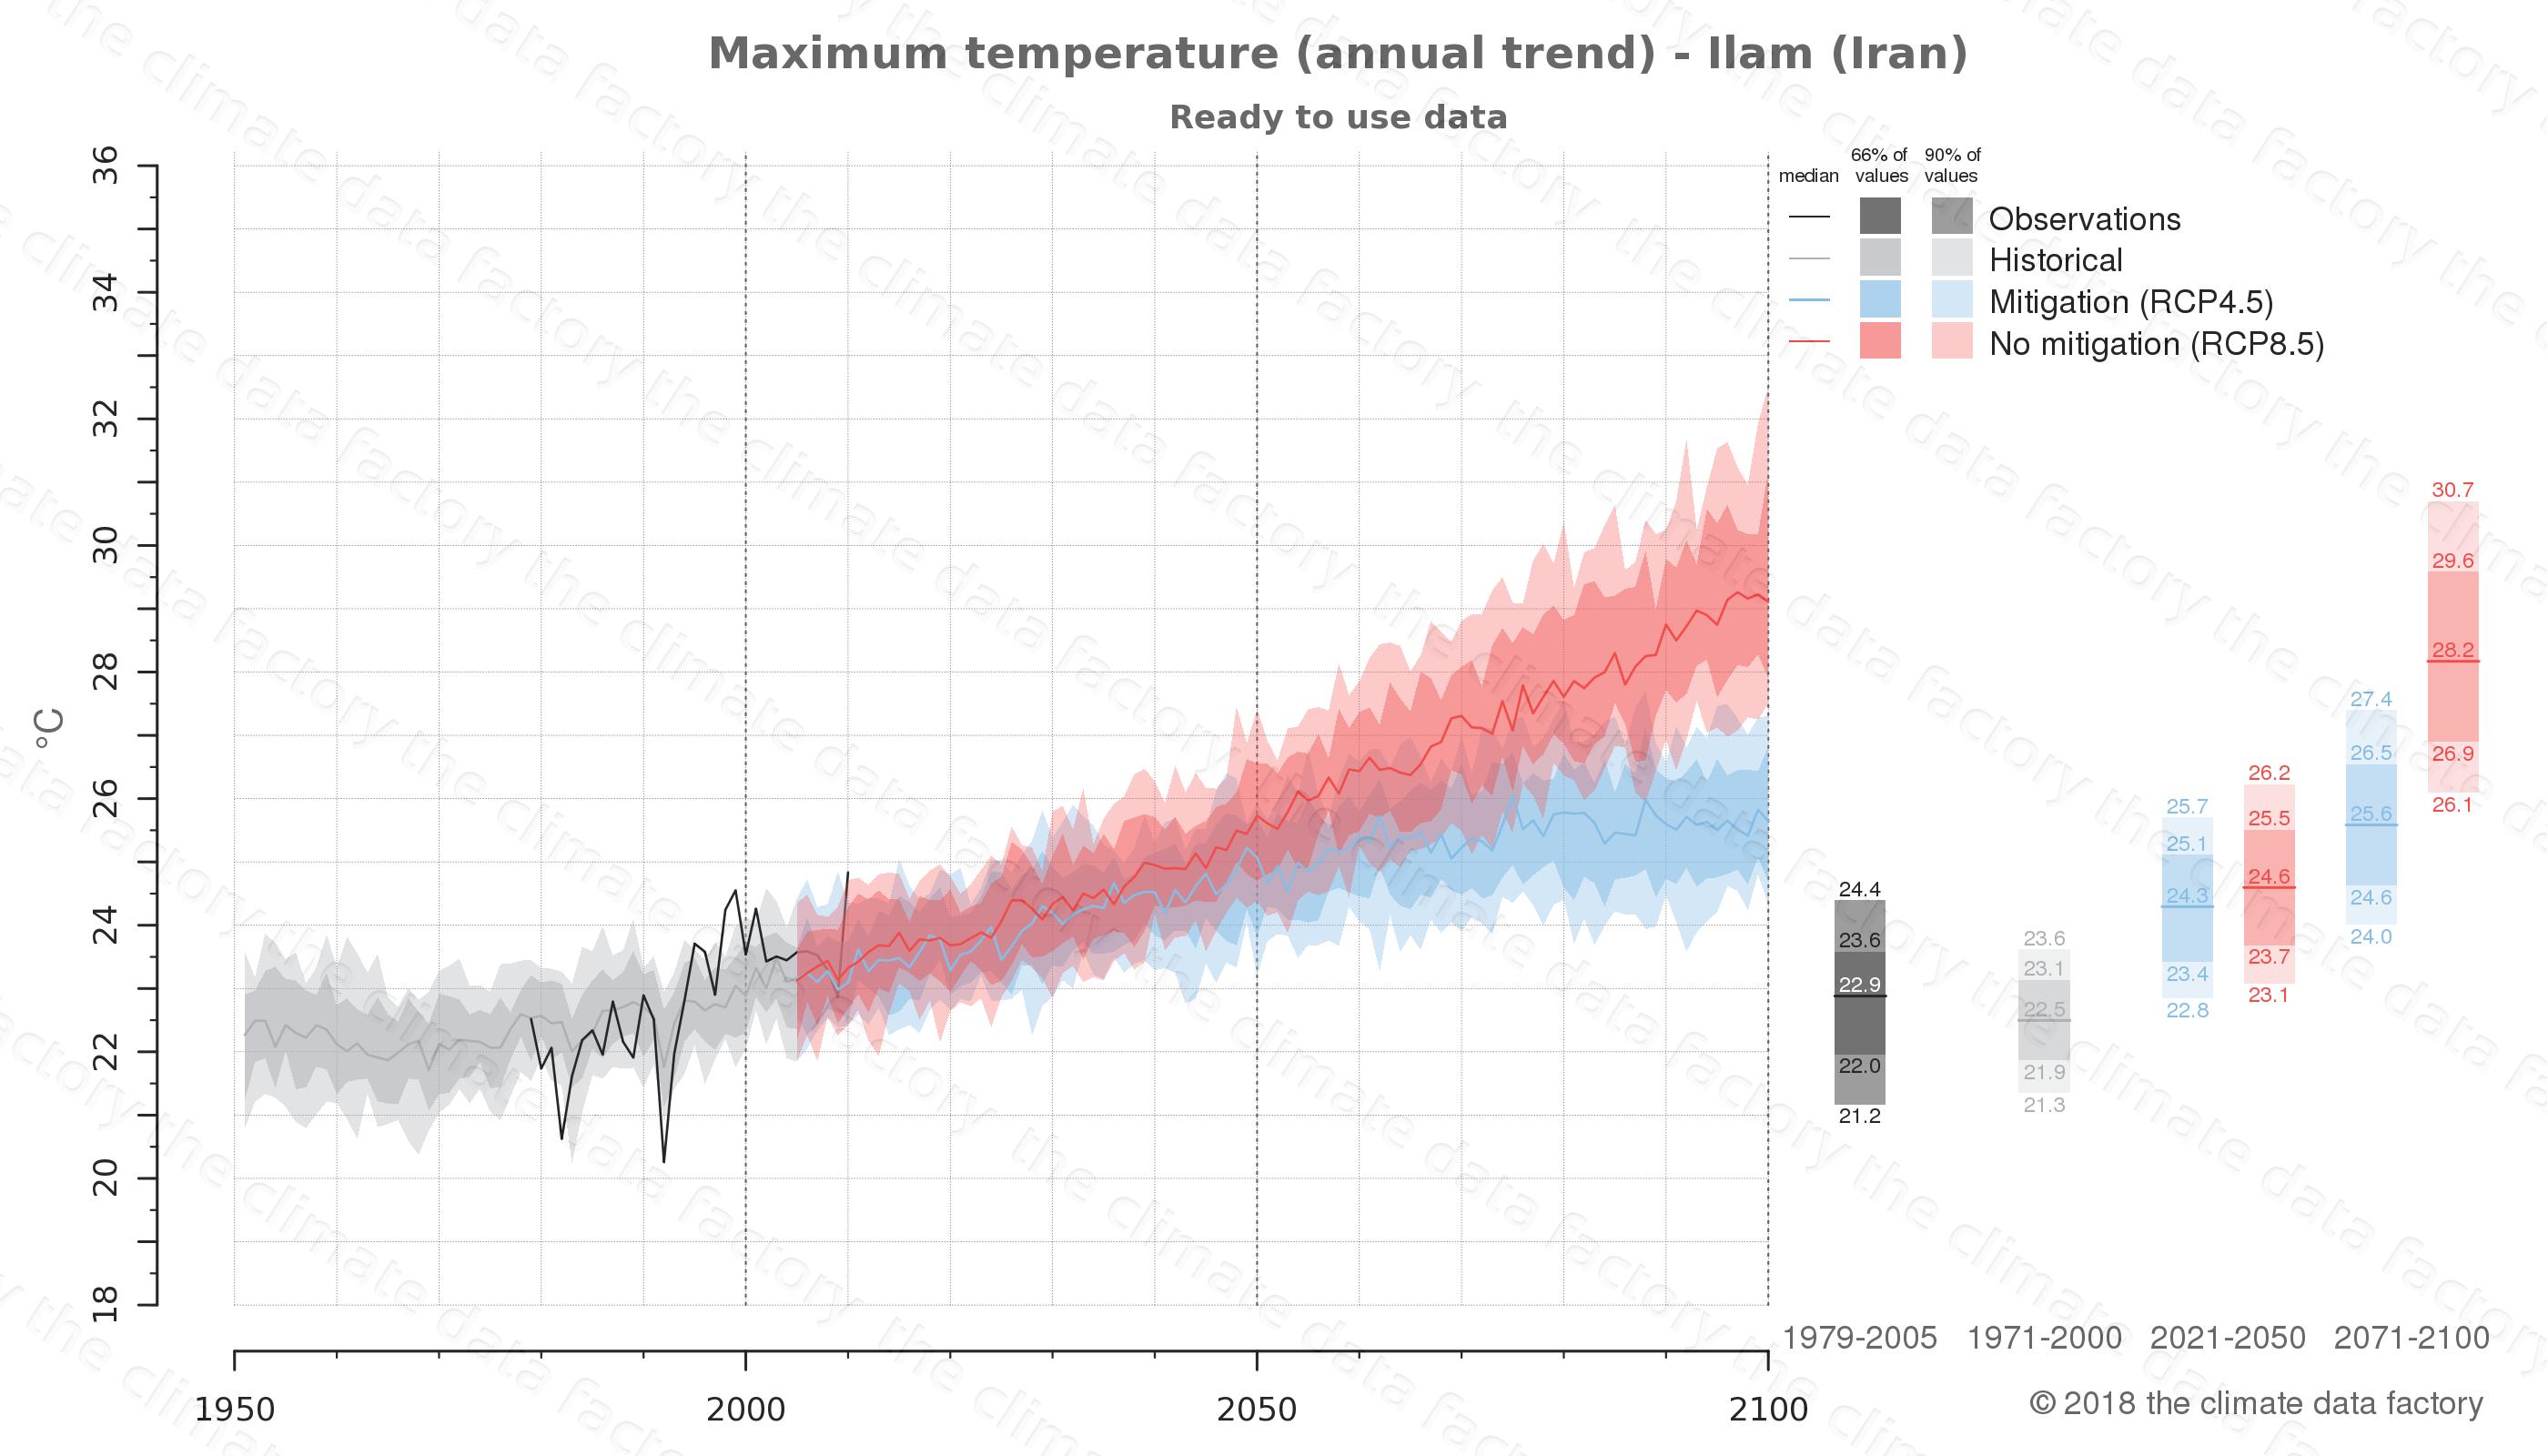 climate change data policy adaptation climate graph city data maximum-temperature ilam iran